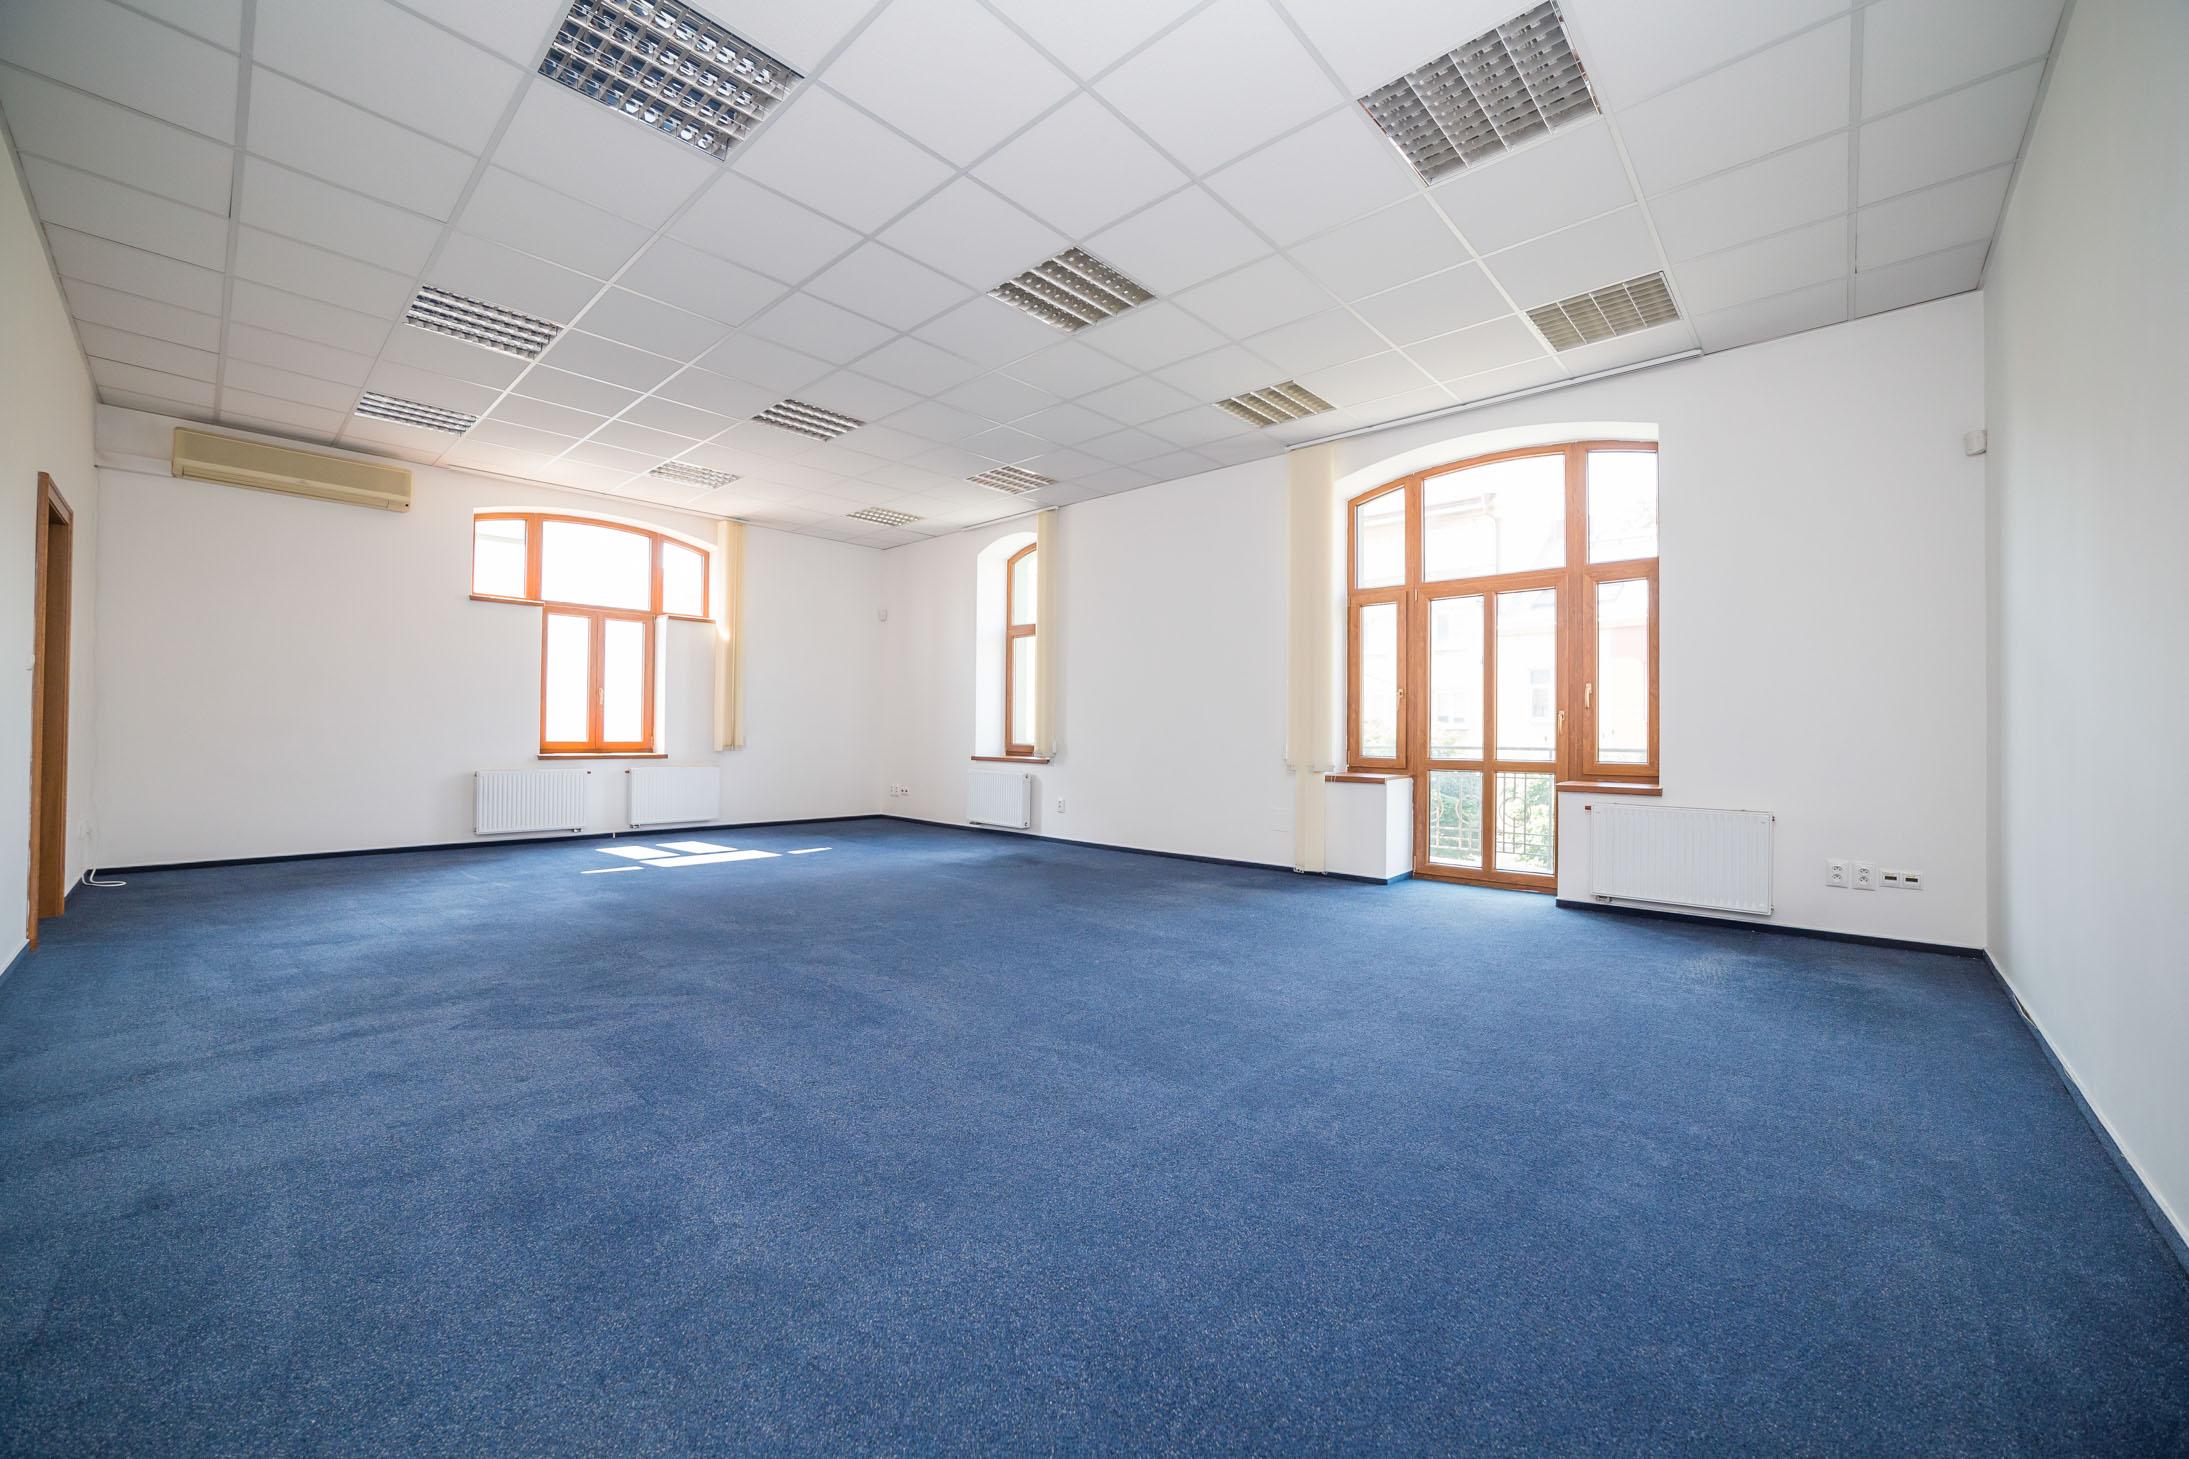 opava reality modry koberec okno balkon klimatizace dvere zasuvka radiator